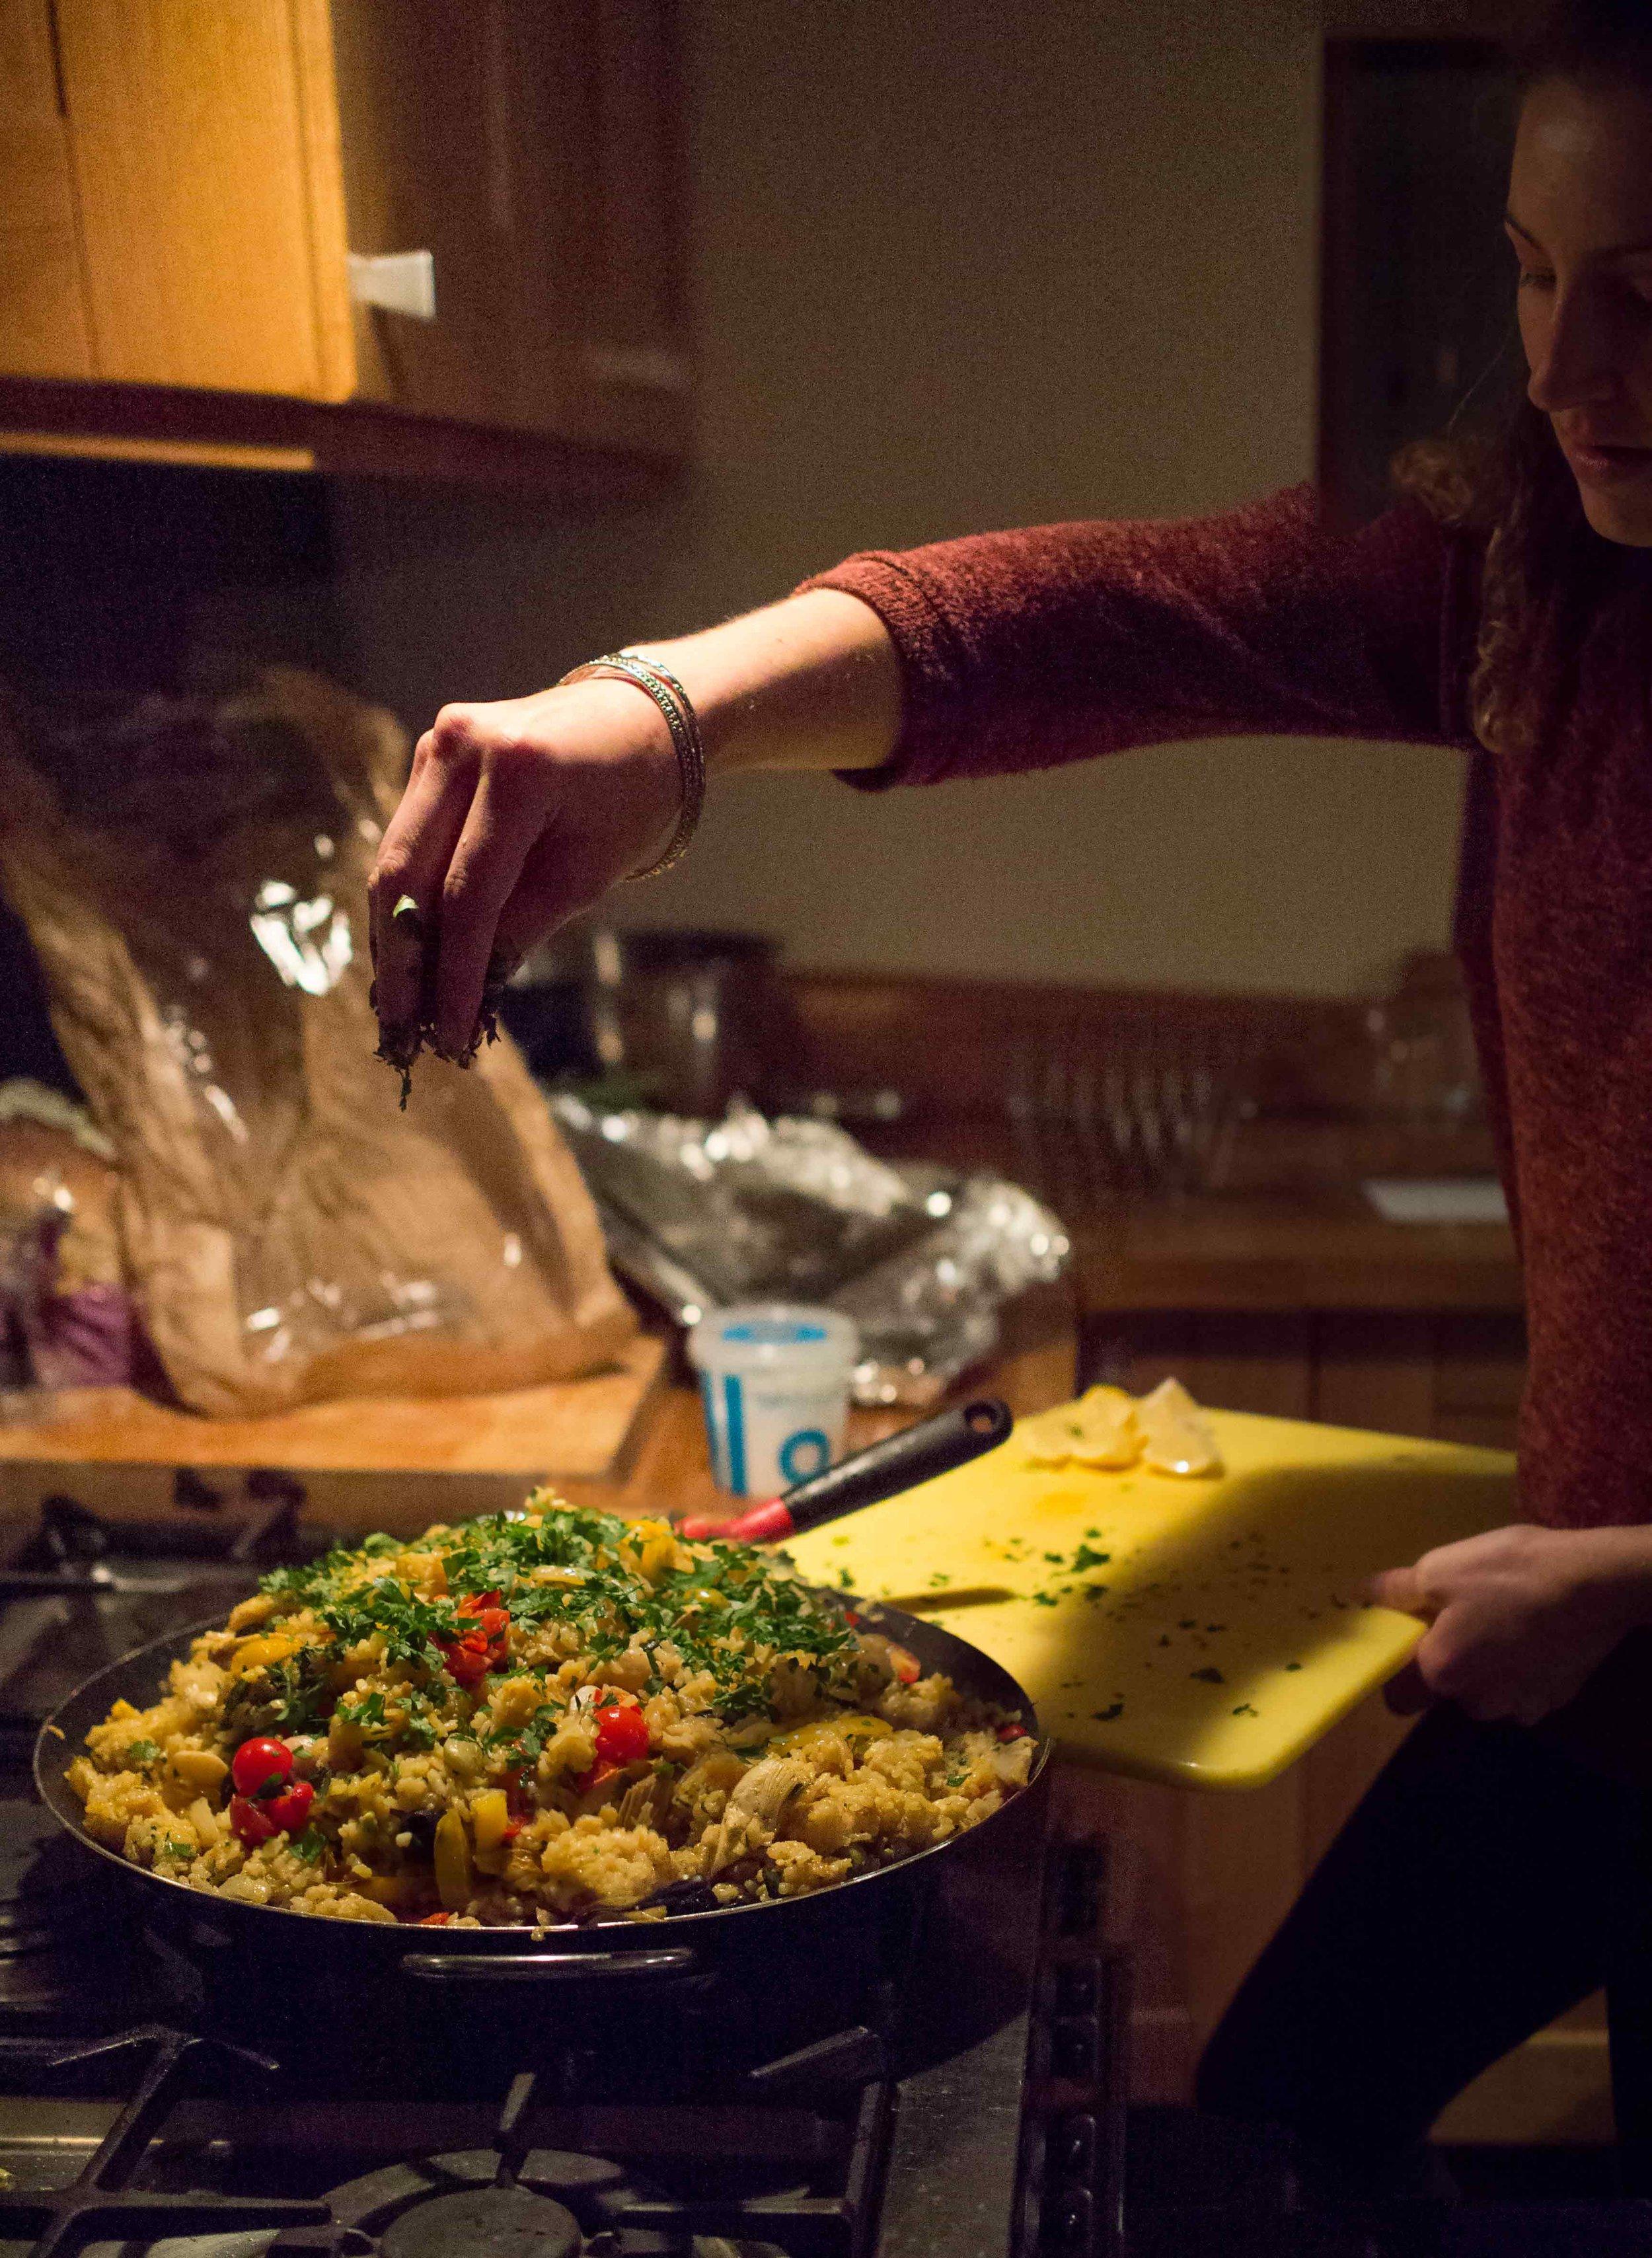 Dinner is served. My friend Svenja producing this amazing pepper & broad bean paella.